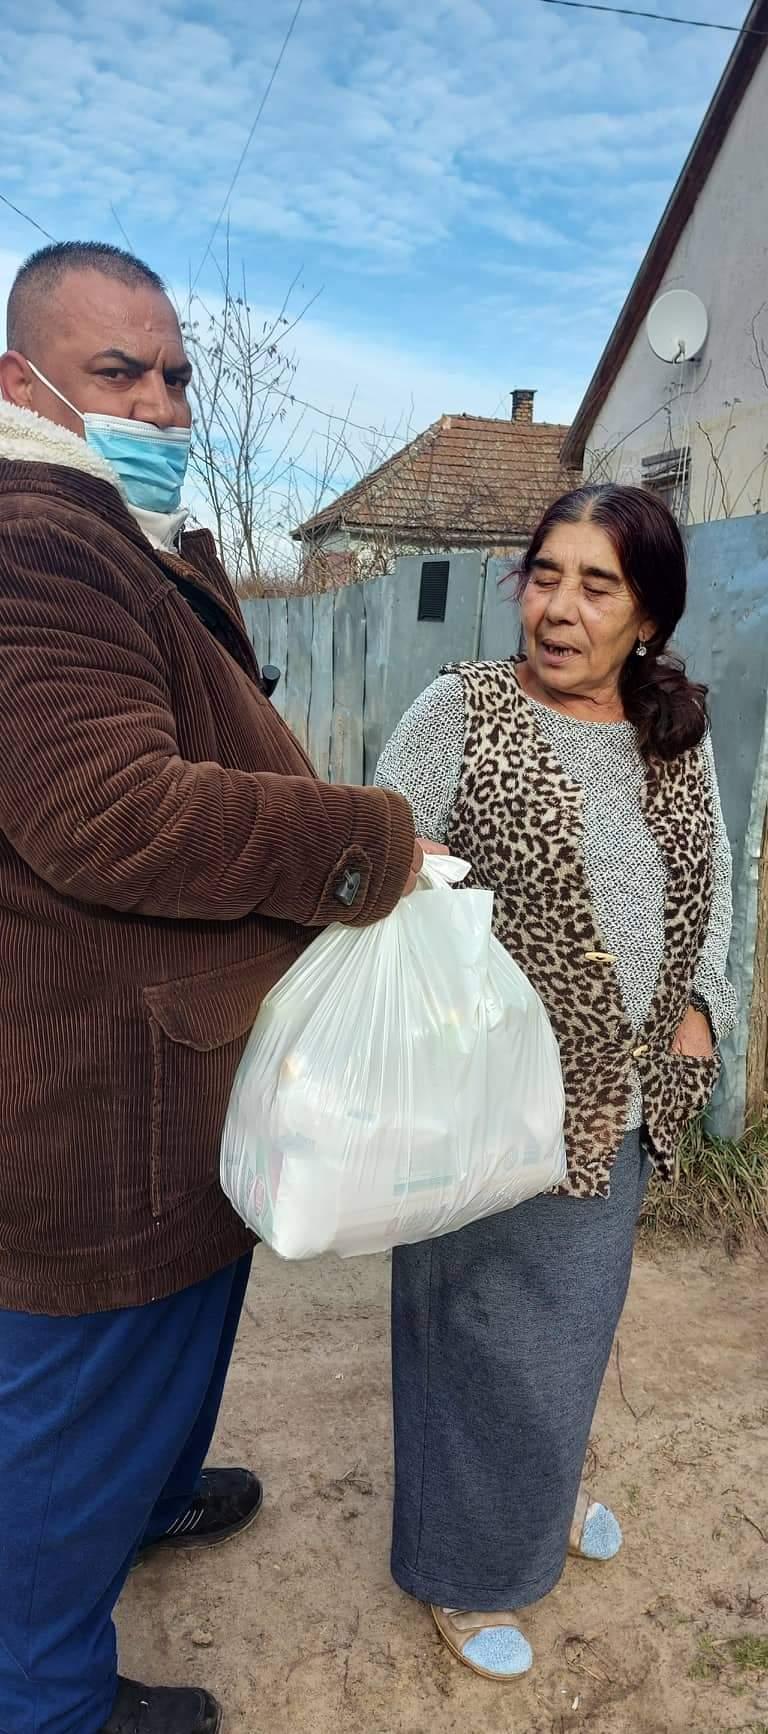 adomanyozas_2021februar_nyirmihalydi_06